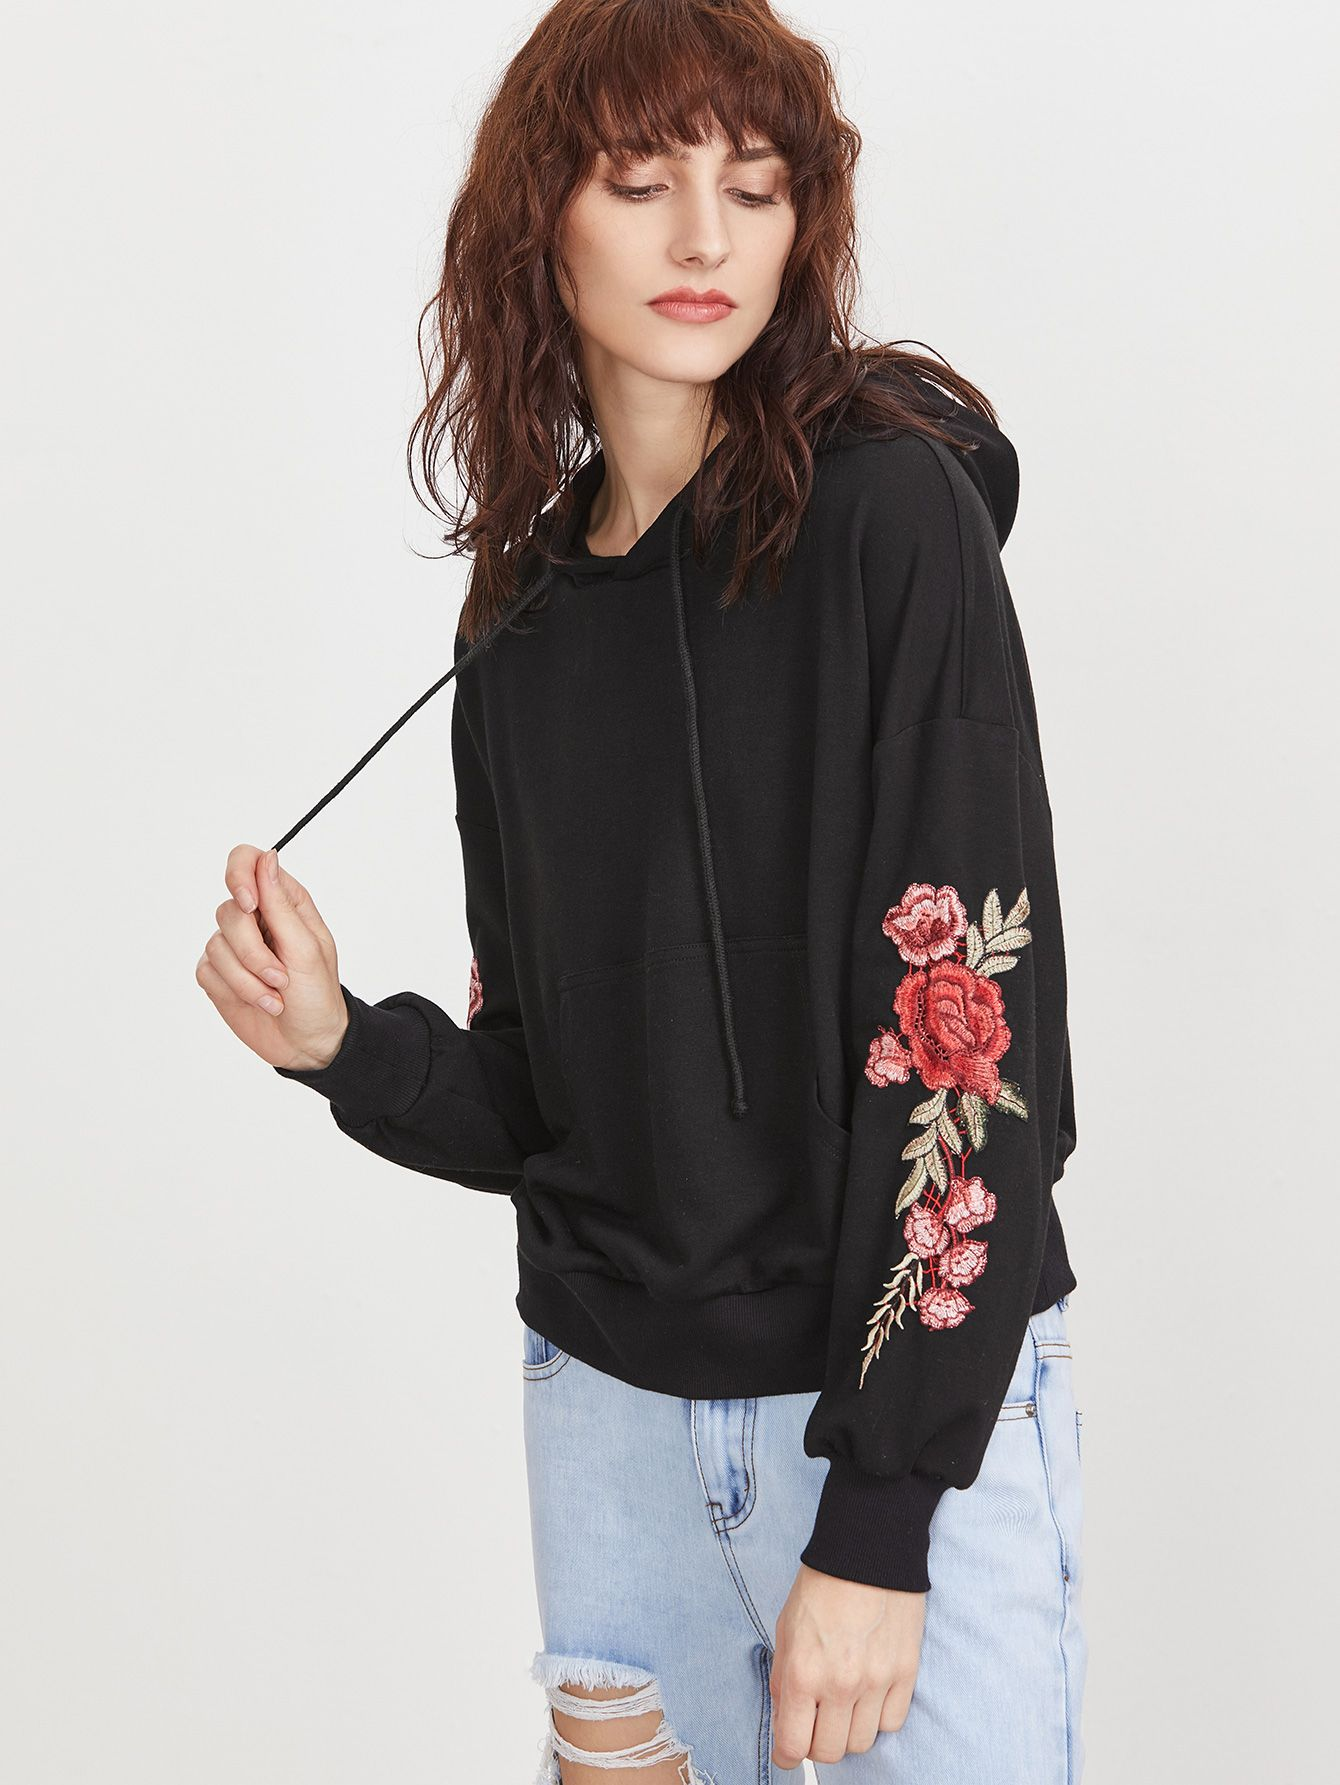 Womens Floral Applique Rose Zipper Hoodie Ladies Gym Sports Wear Sweatshirt